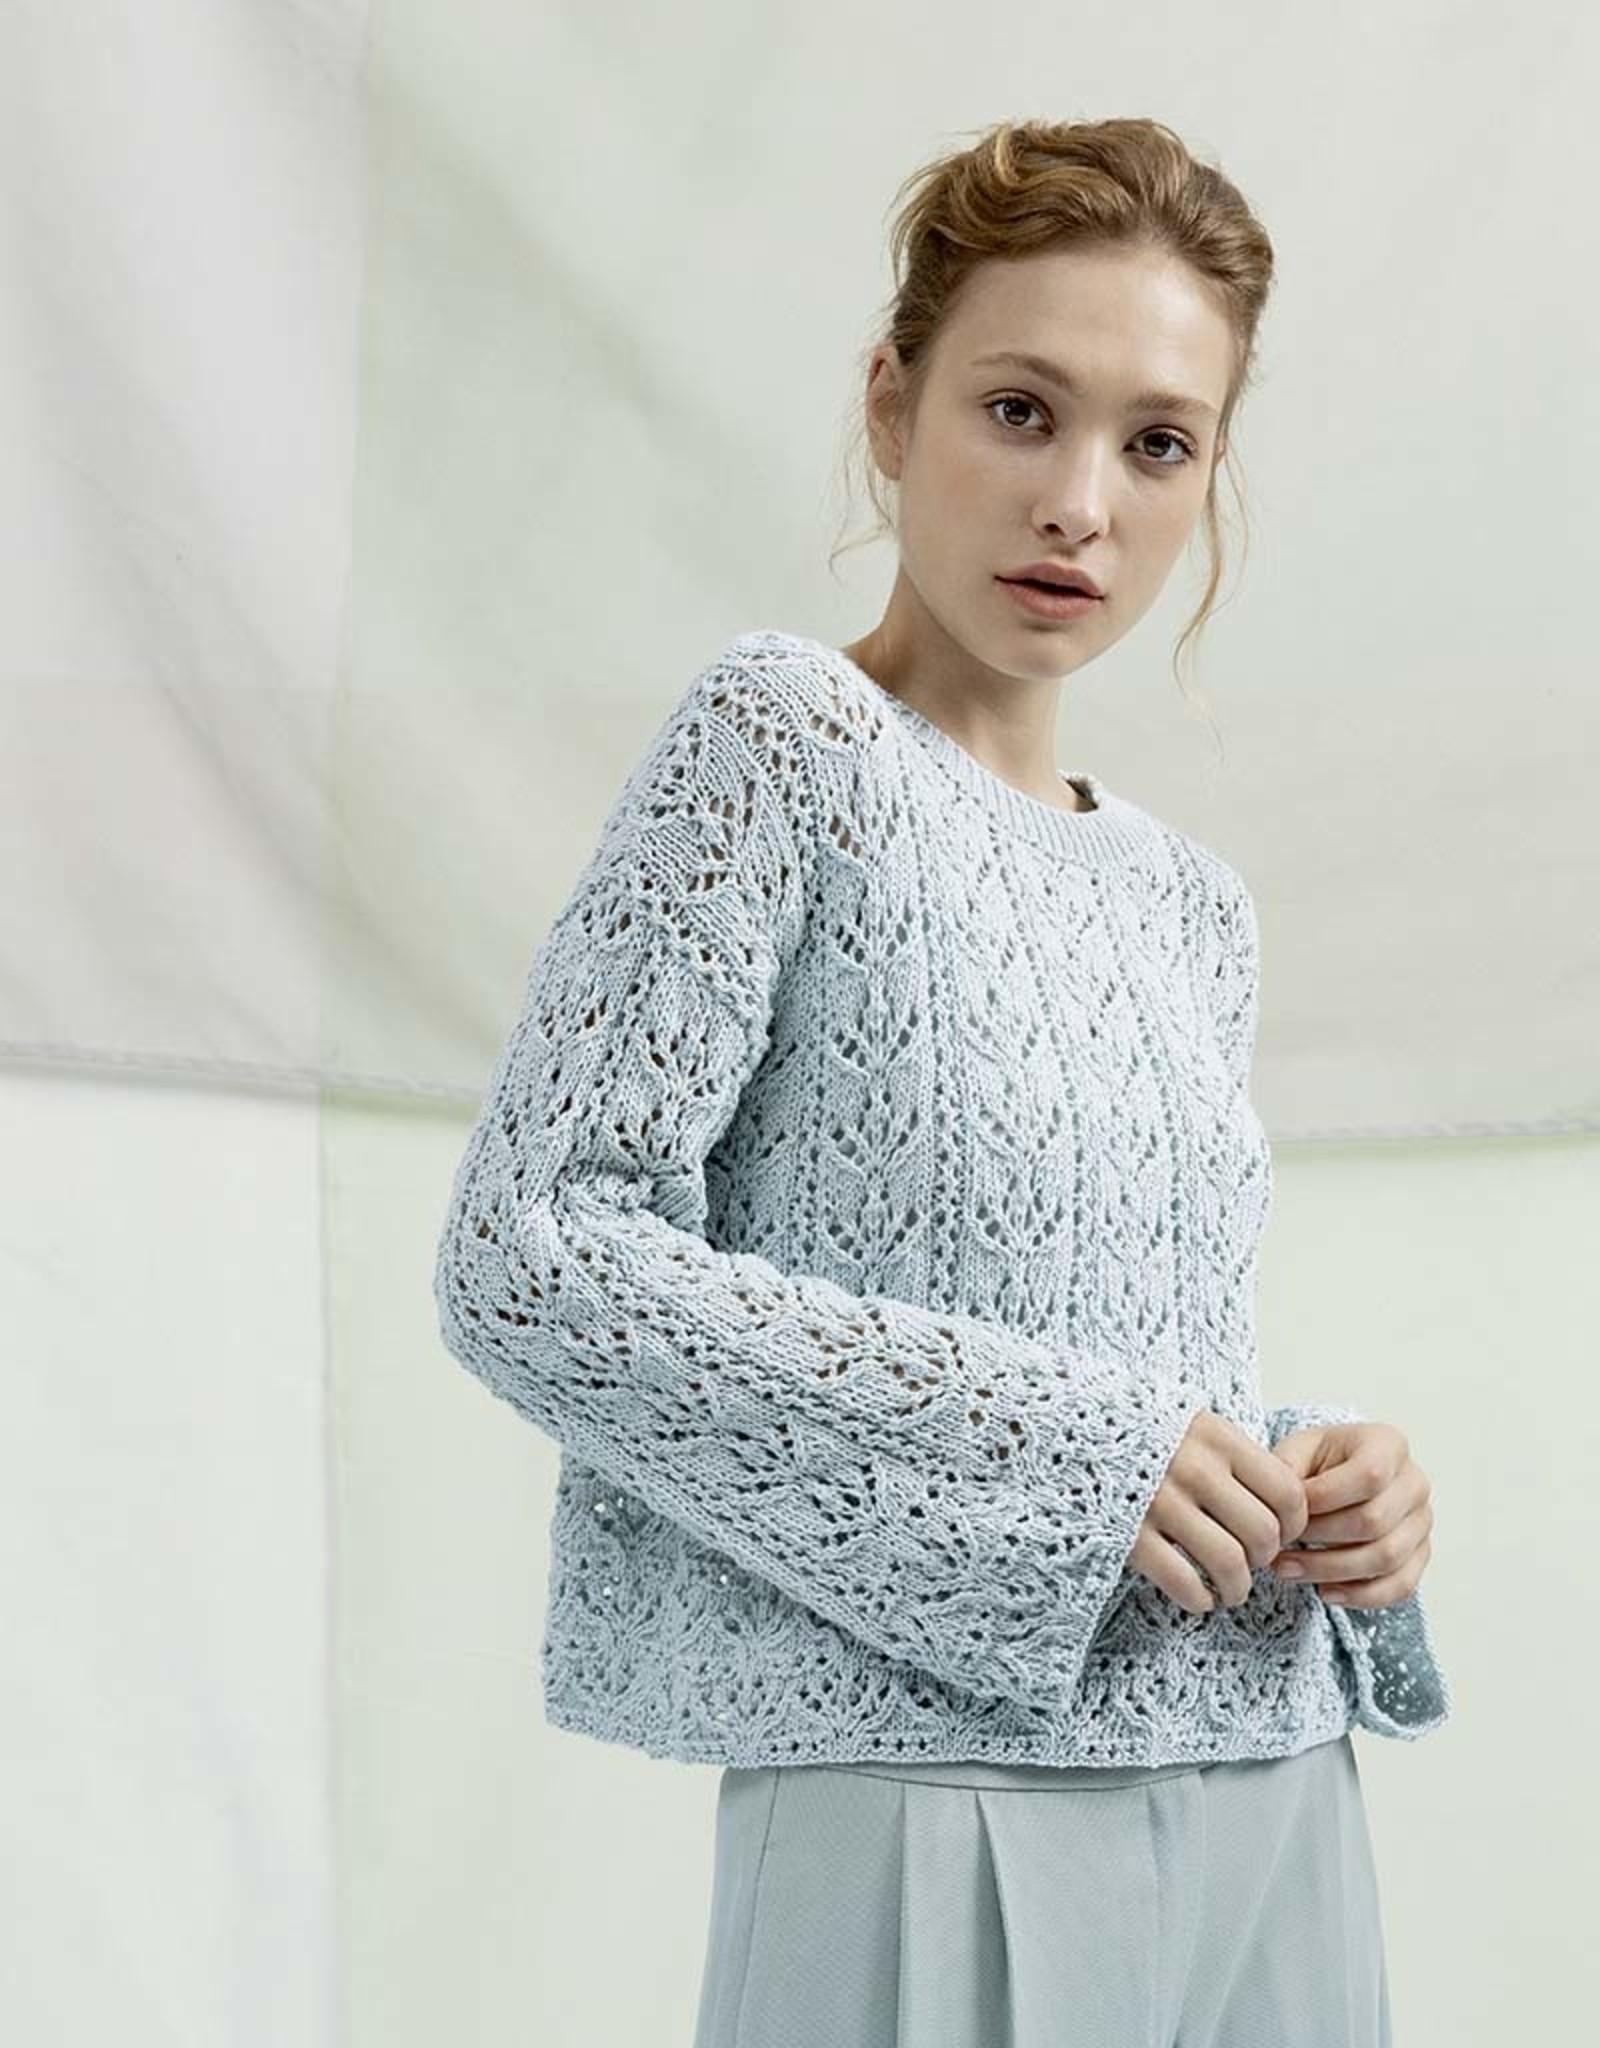 Angels-Knit by FDF Breipakket Soft Cotton 072 - S/M